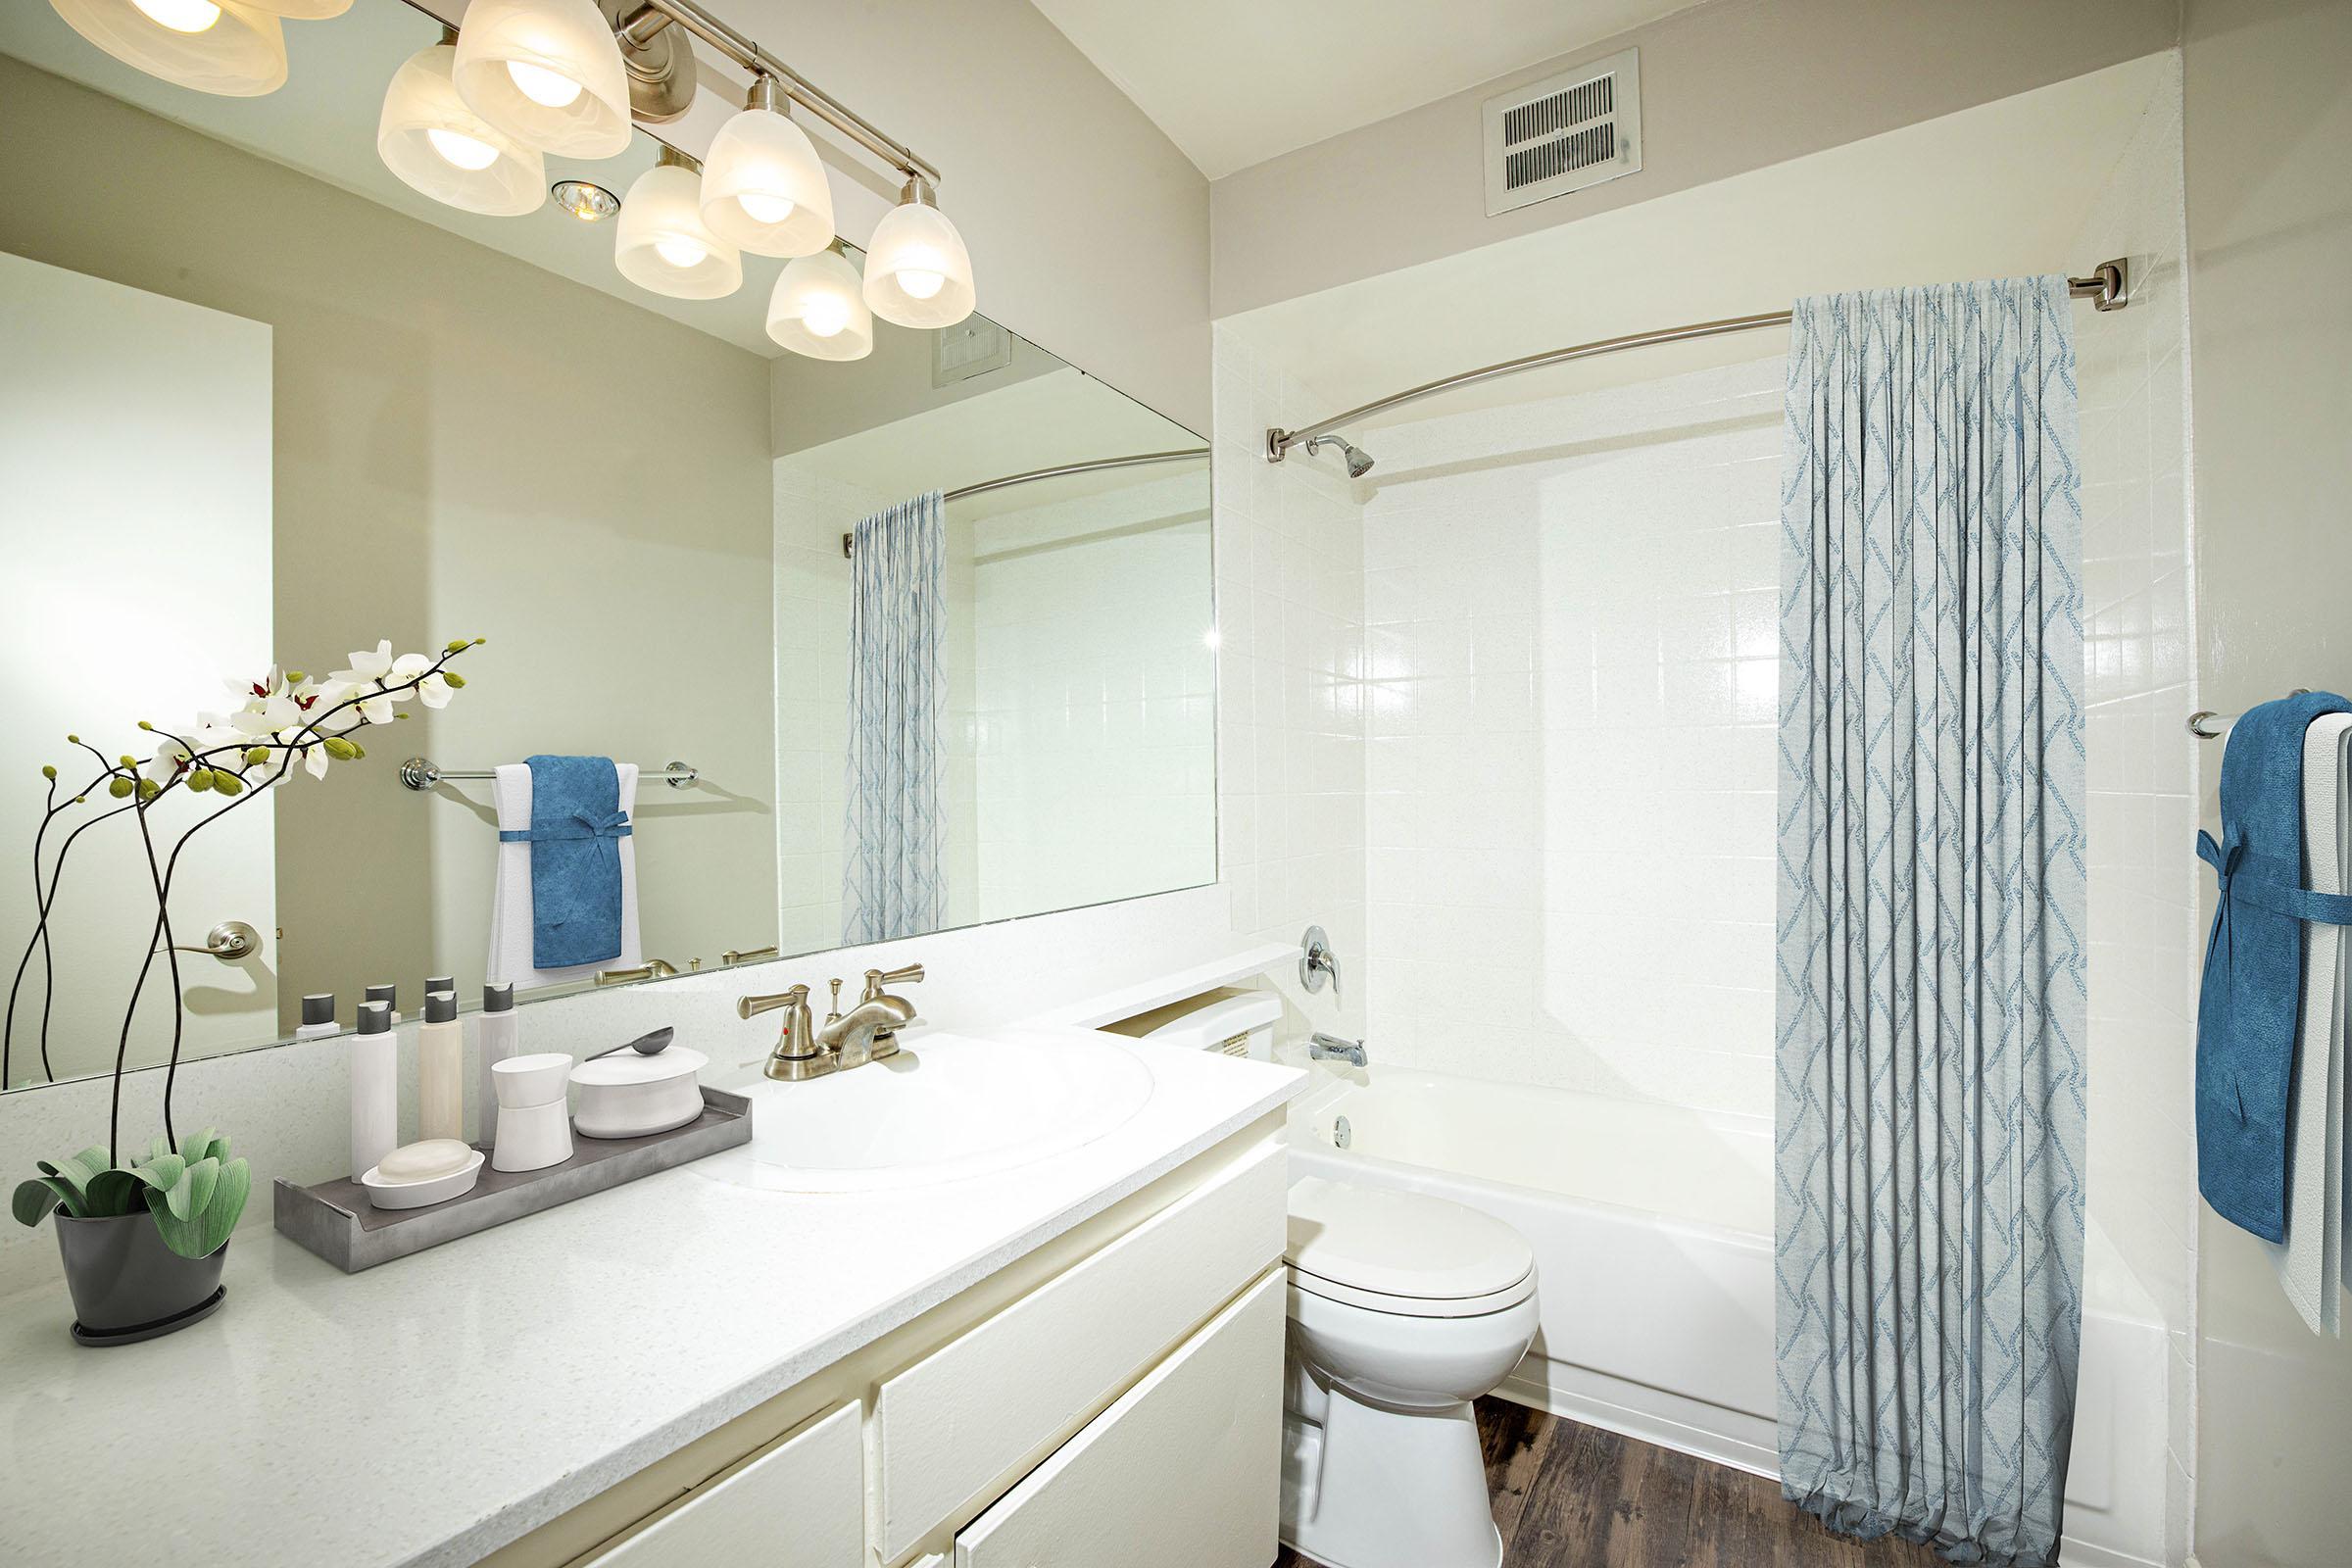 Modern bathrooms at Casa Hermosa in San Diego, California